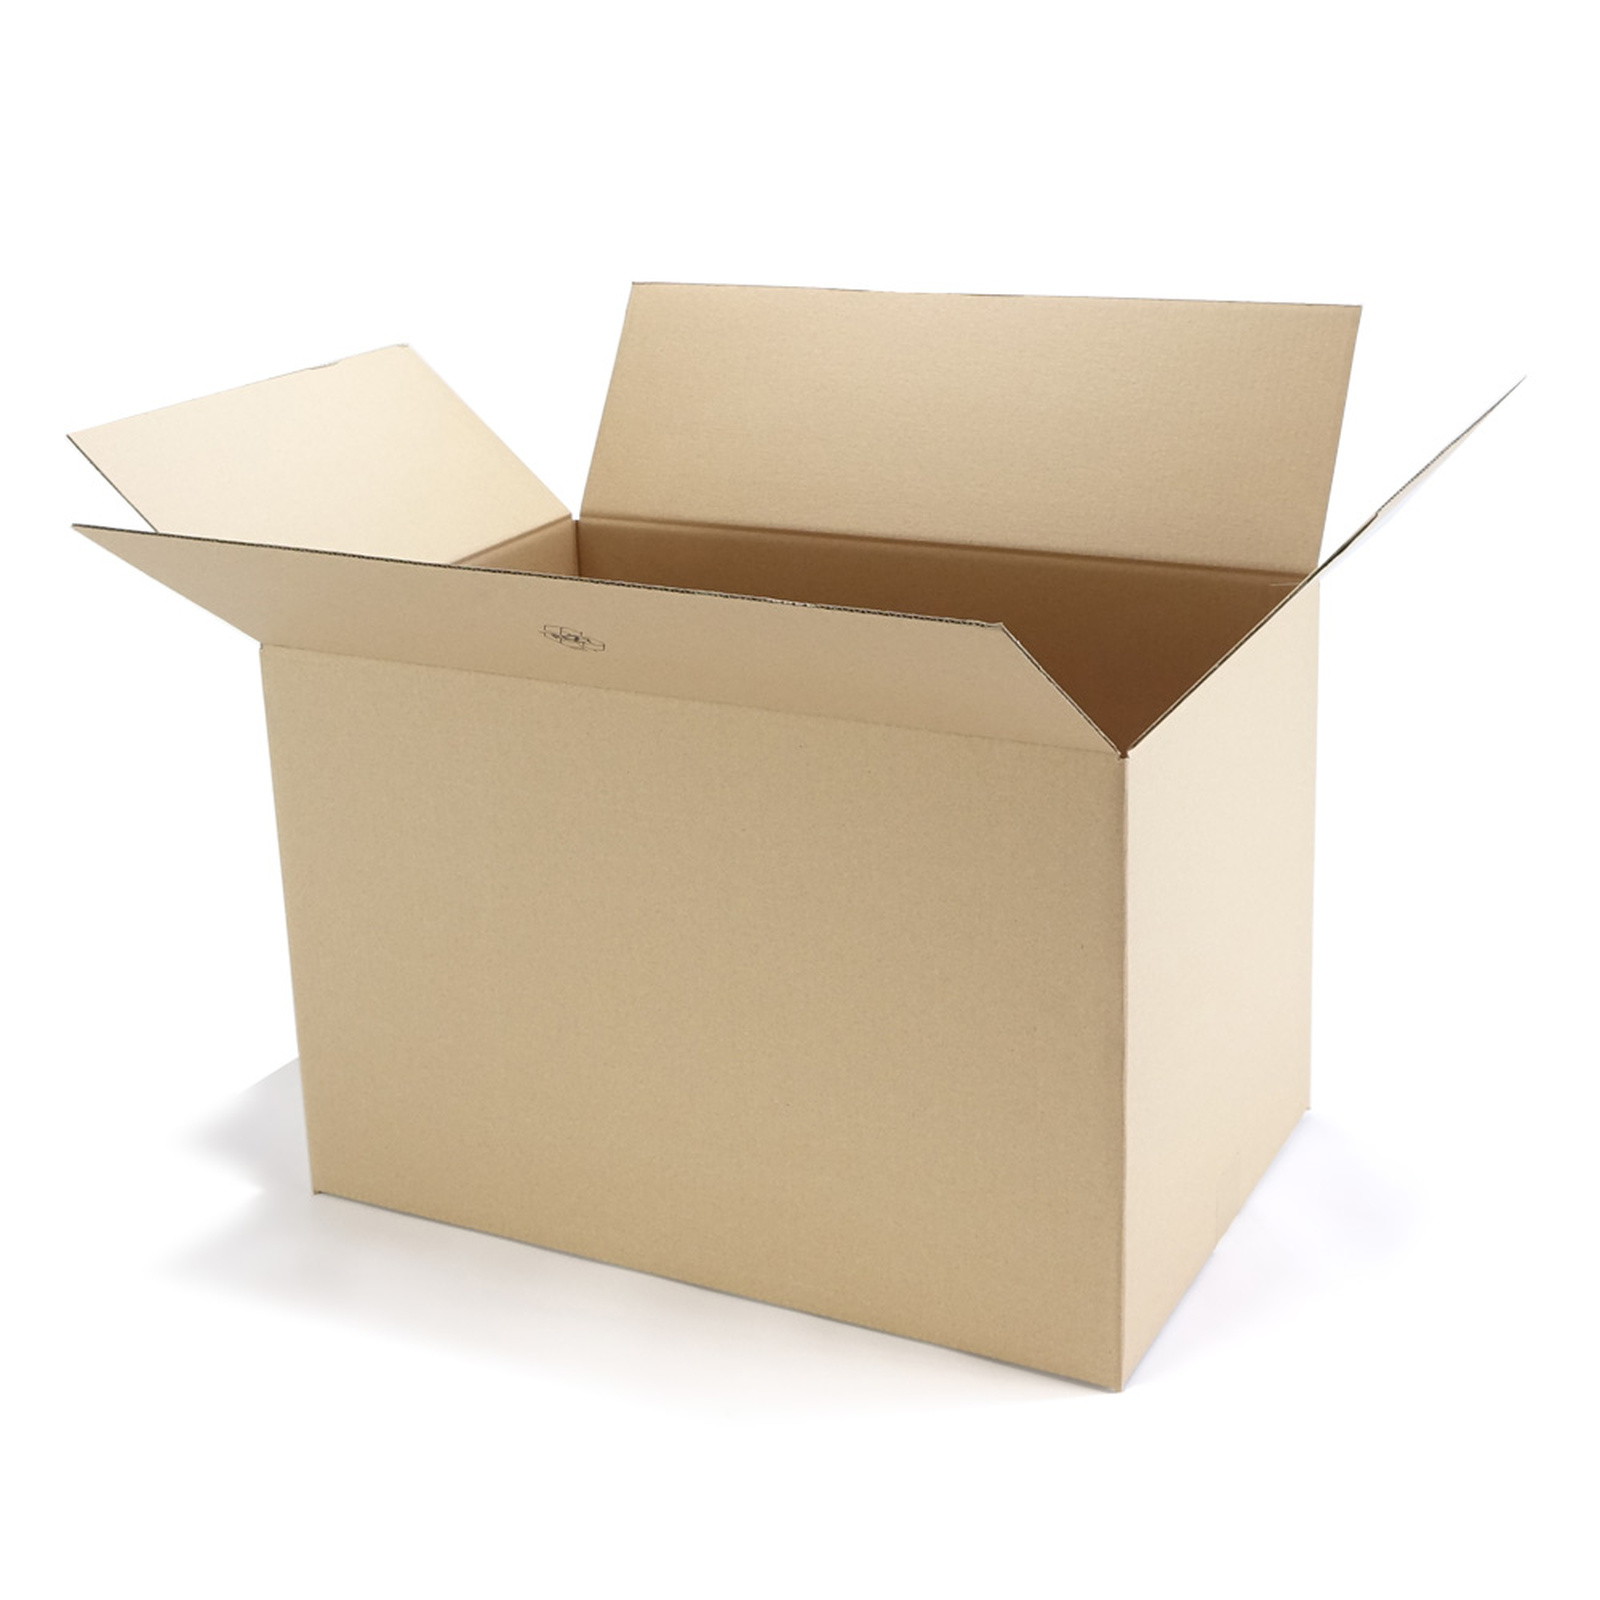 einwellige kartons 600x400x400 mm au enma 1 05. Black Bedroom Furniture Sets. Home Design Ideas